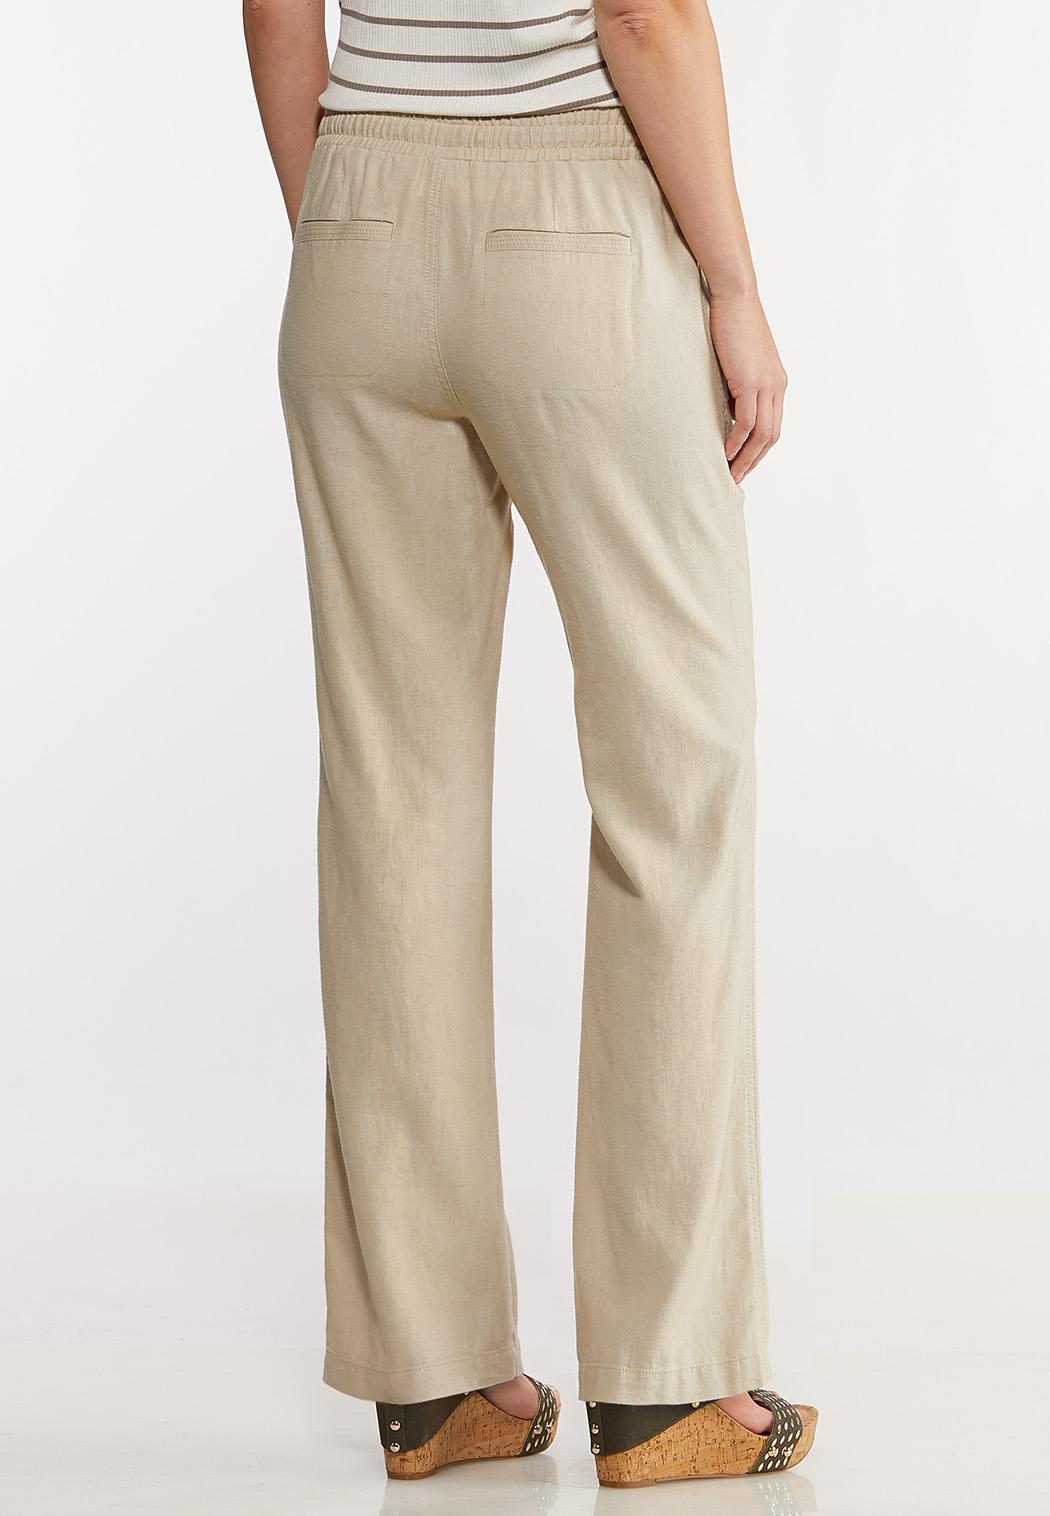 Petite Drawstring Linen Pants (Item #44227155)